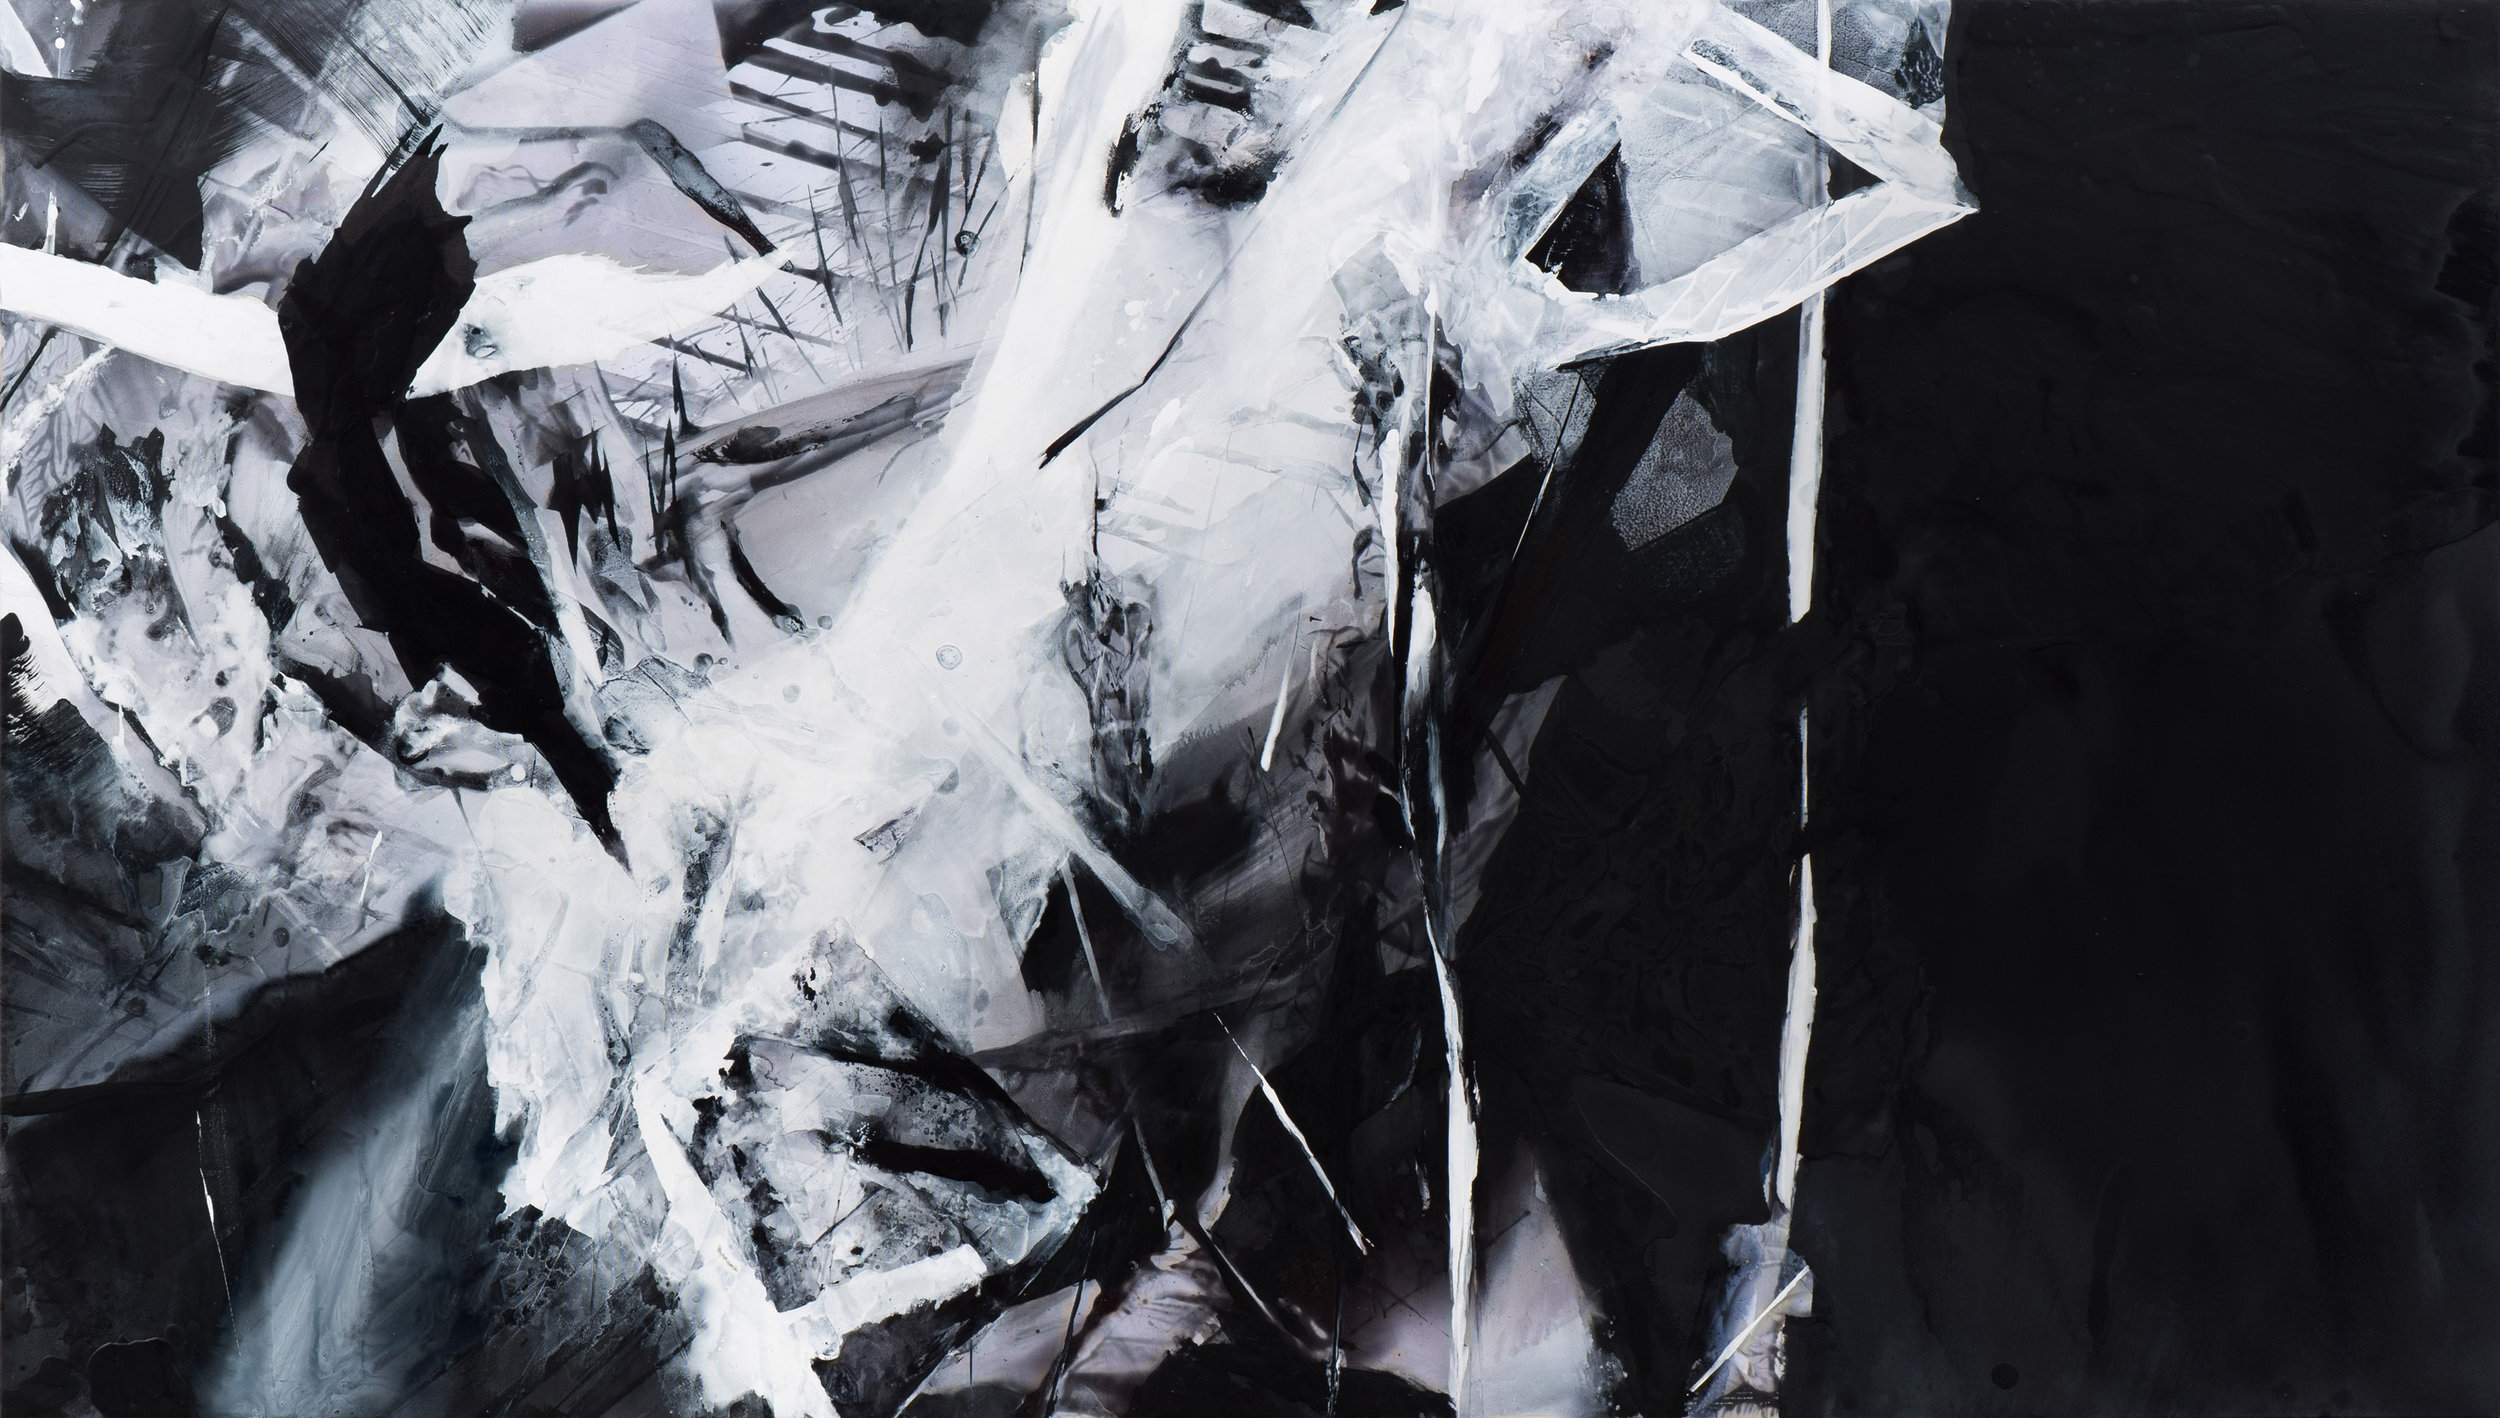 Precipice , 2017 Acrylic on polyester 35 x 61 1/2 inches CLBA-0038 $13,500